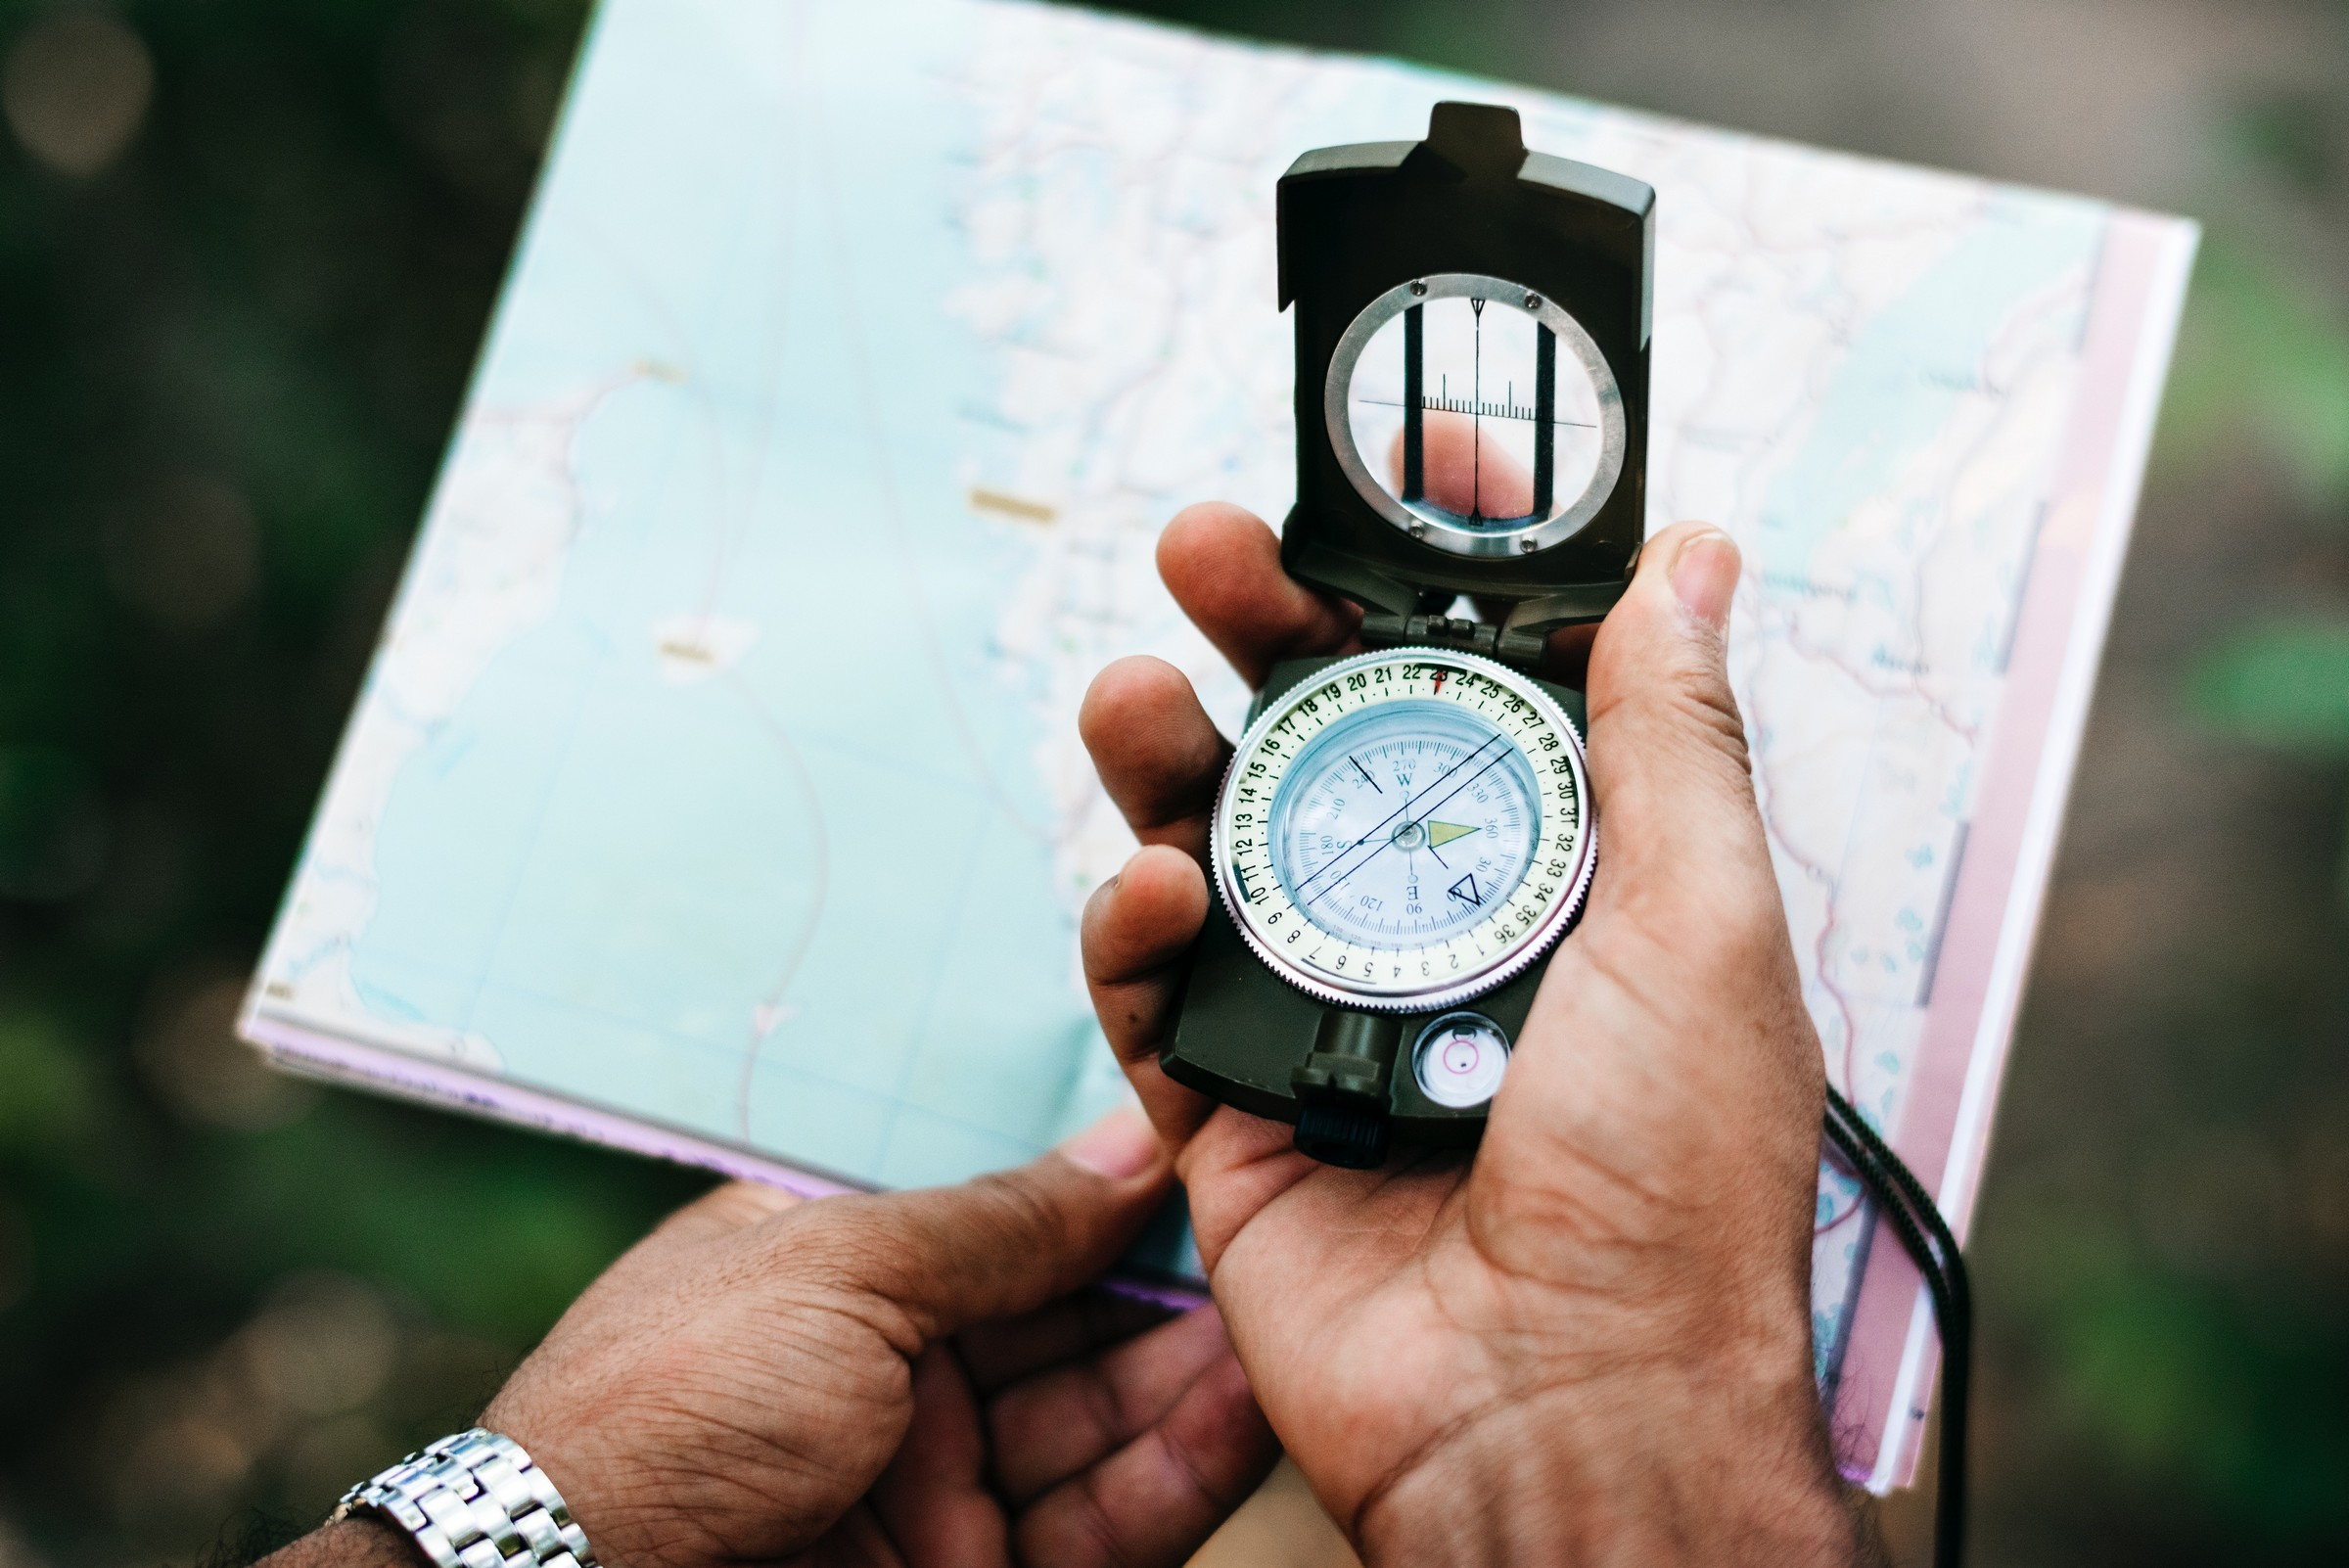 Compass For Navigation